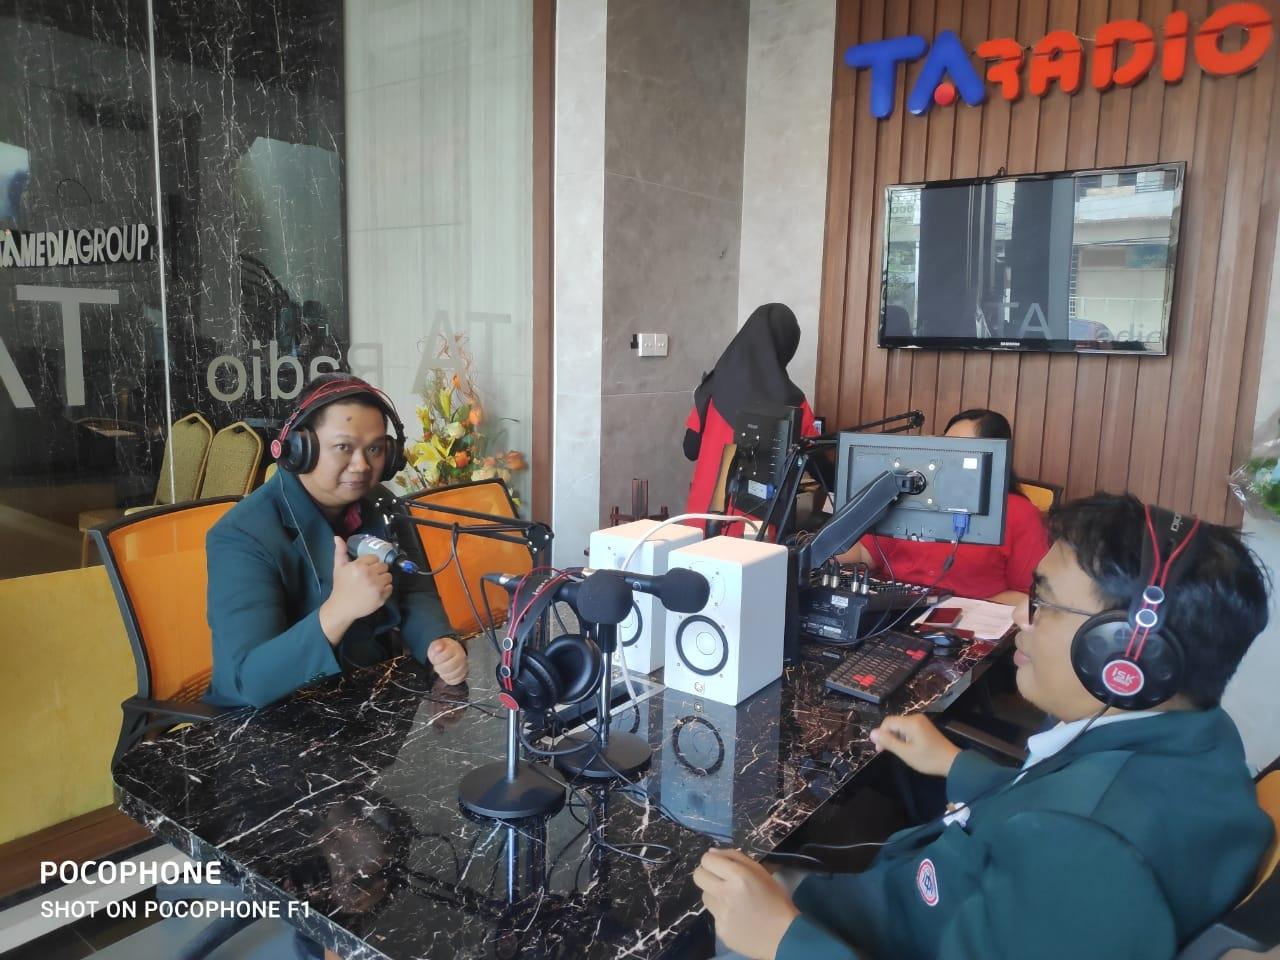 Mahasiswa S3 IKM UNS menjadi narasumber di TA Radio mengupas tentang penanggulangan penyebaran wabah COVID-19 di Wilayah Kota Surakarta